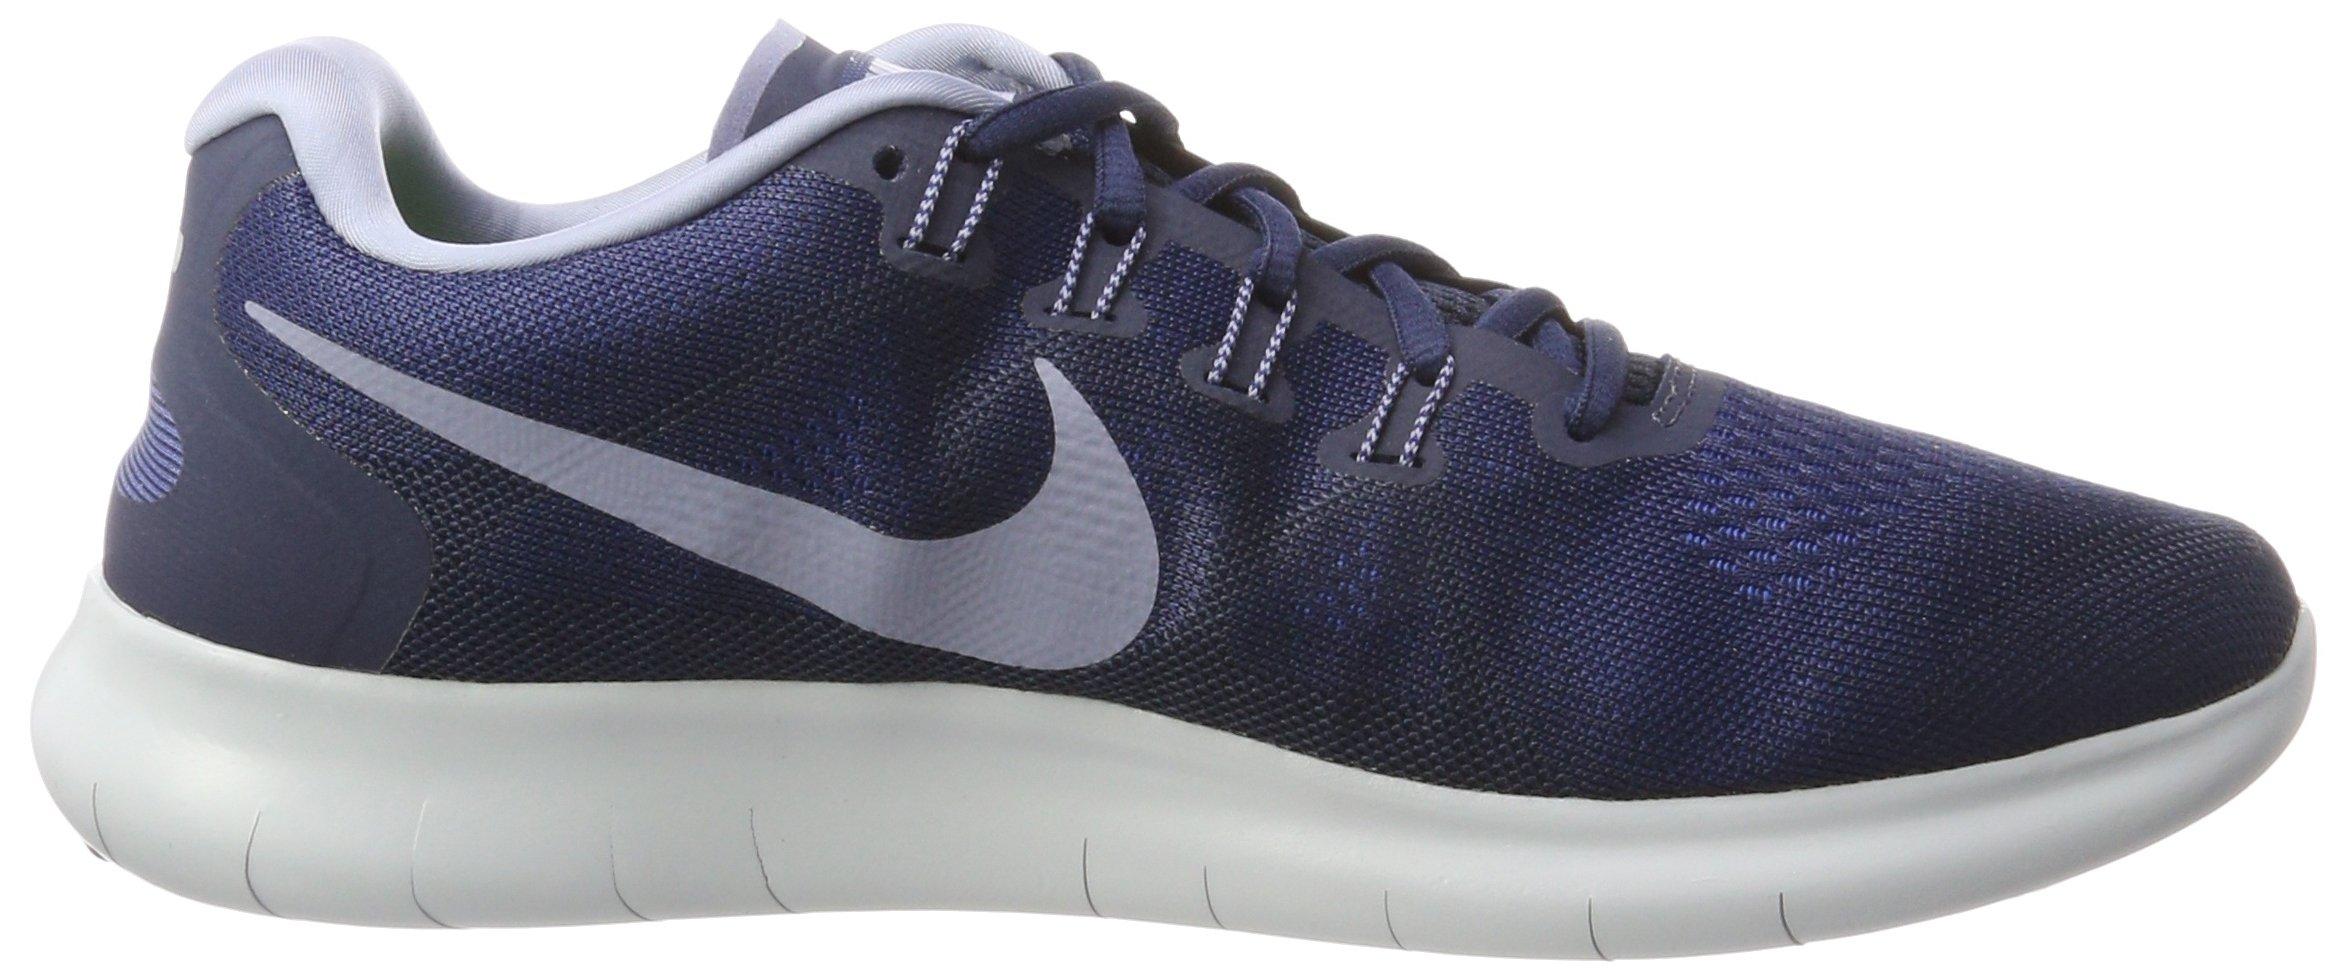 Nike ''Free RN'' 2017 Binary Blue/Dark Sky Blue 8 by Nike (Image #6)